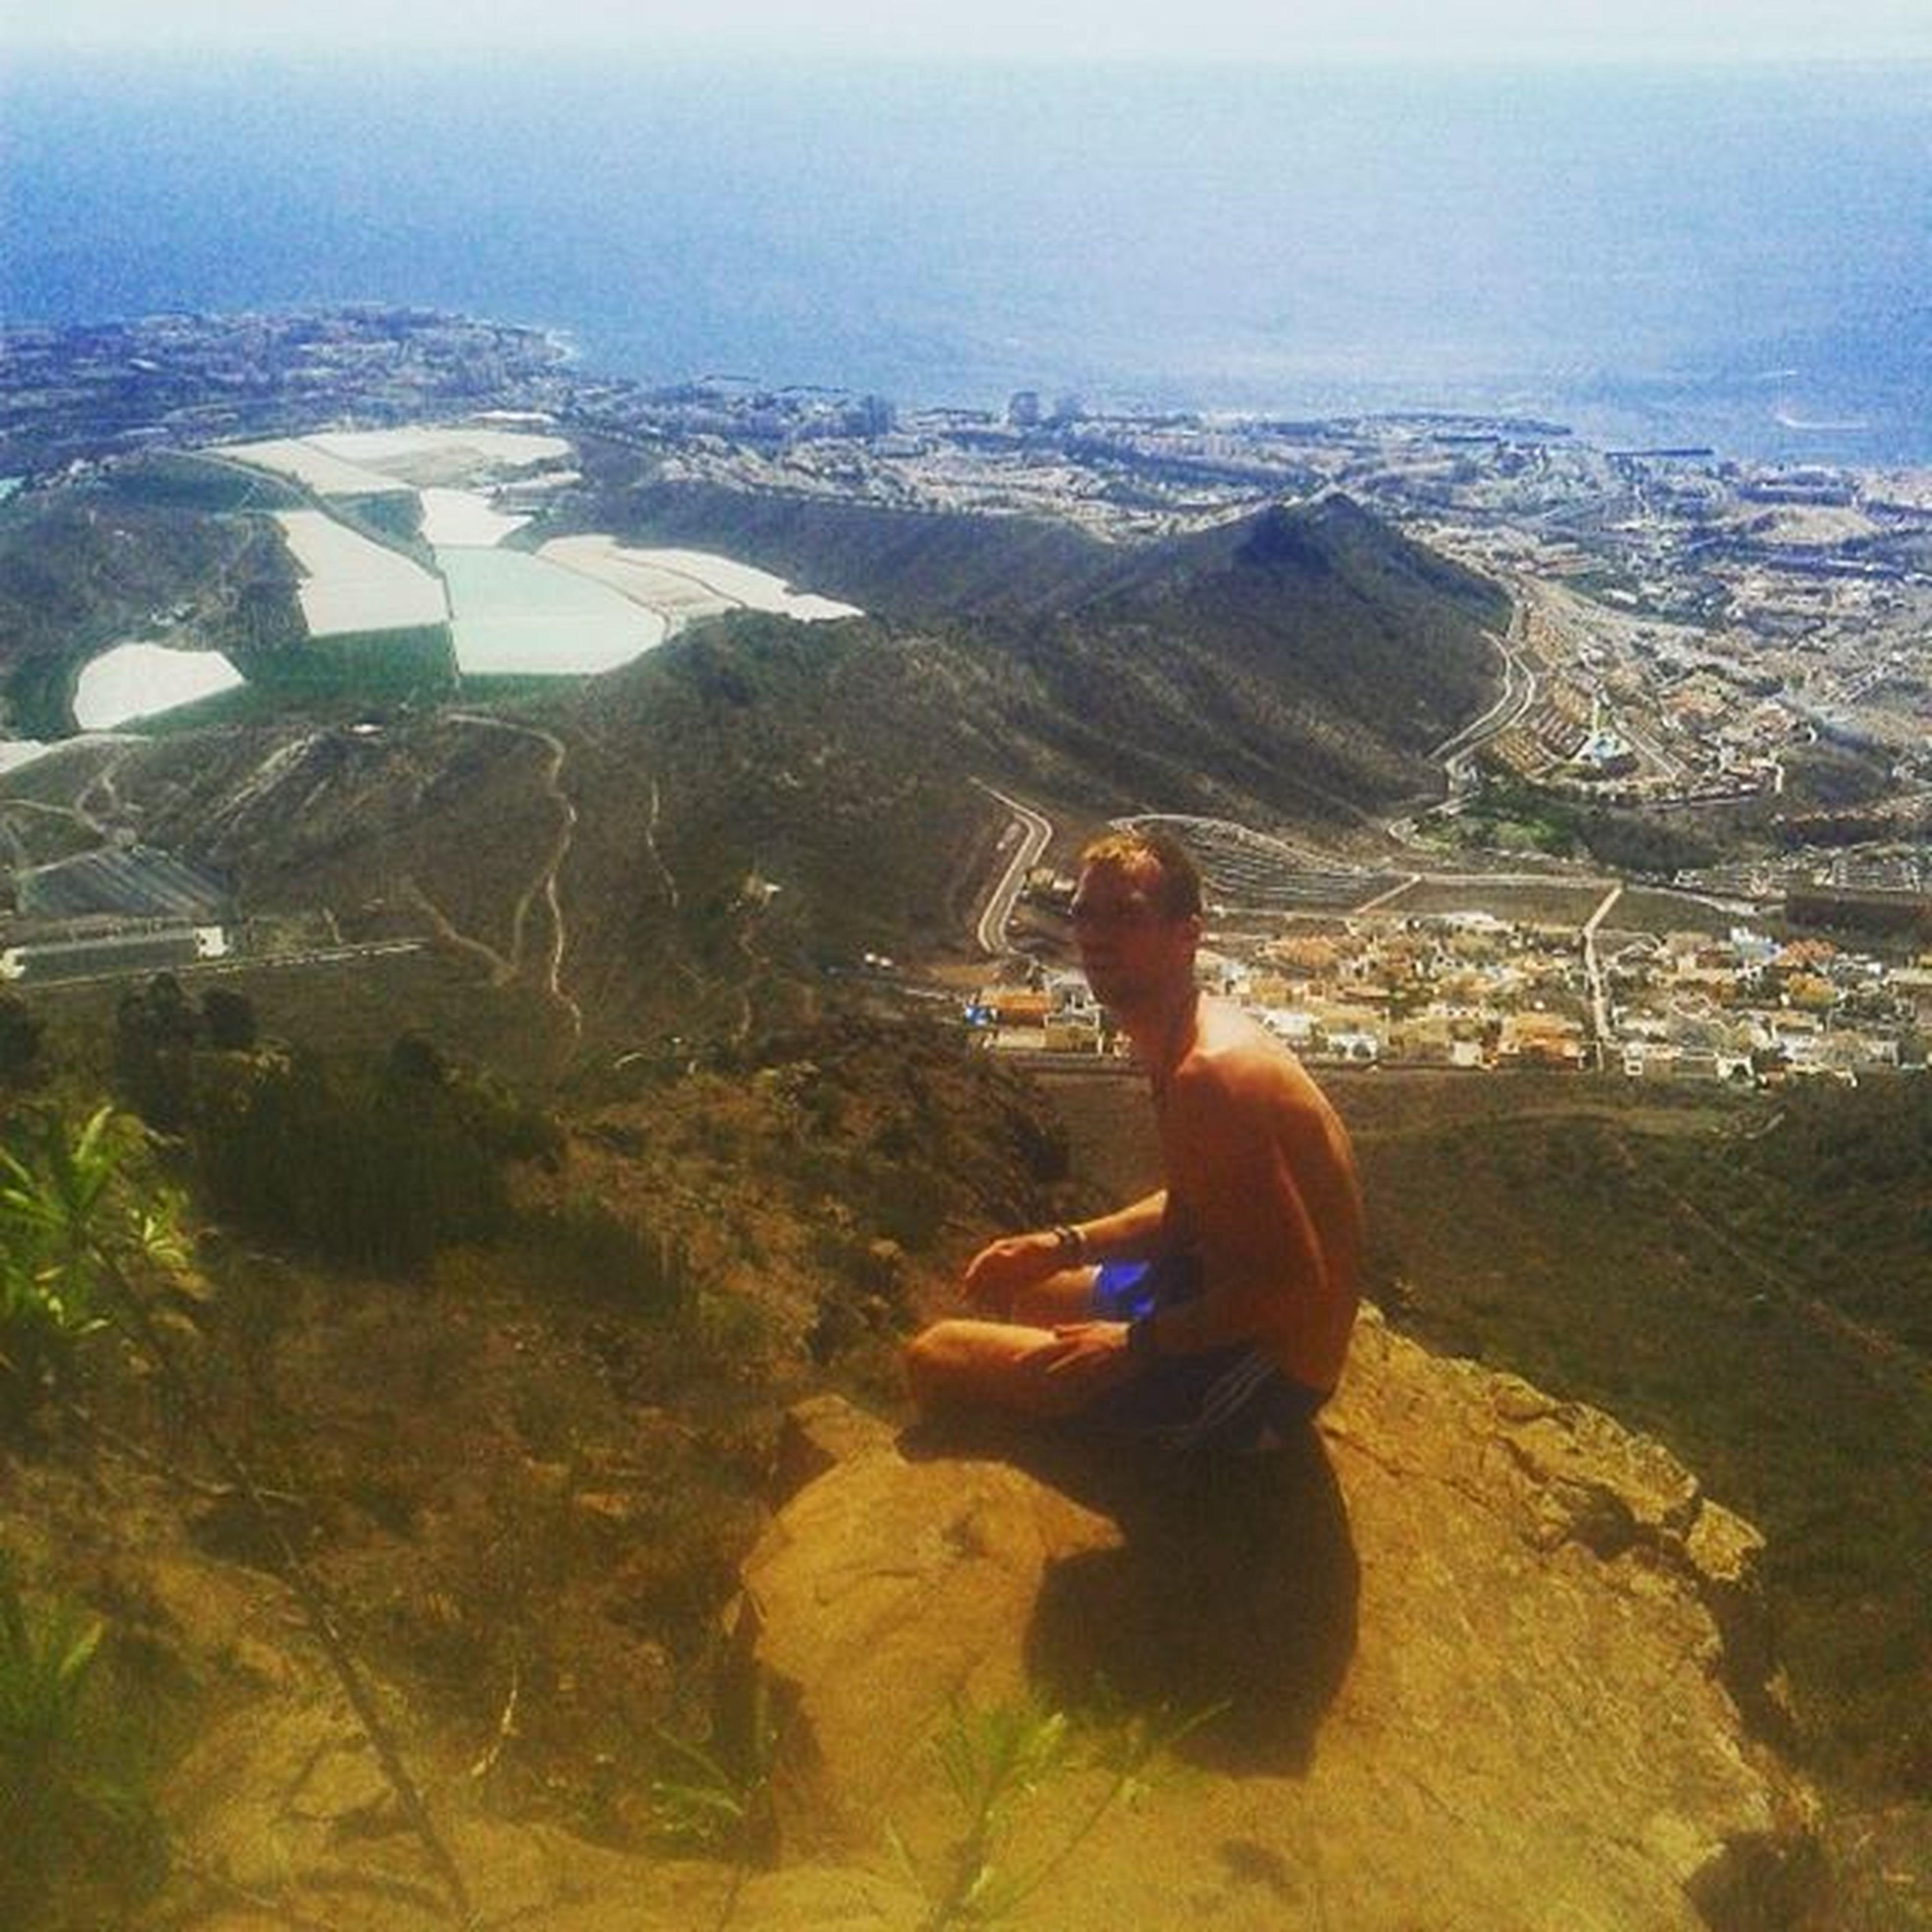 Mountains Mountainclimbing Travel Explore Ontopoftheworld LovingLife Roquedelconde 950mabovesealevel 950 GettingHigh Highup Beautifulview Stunning Awesome Tenerifesea Southtenerife Cactus Redrocks Beautifulterrain Whataview Anothersunday Lovemountains